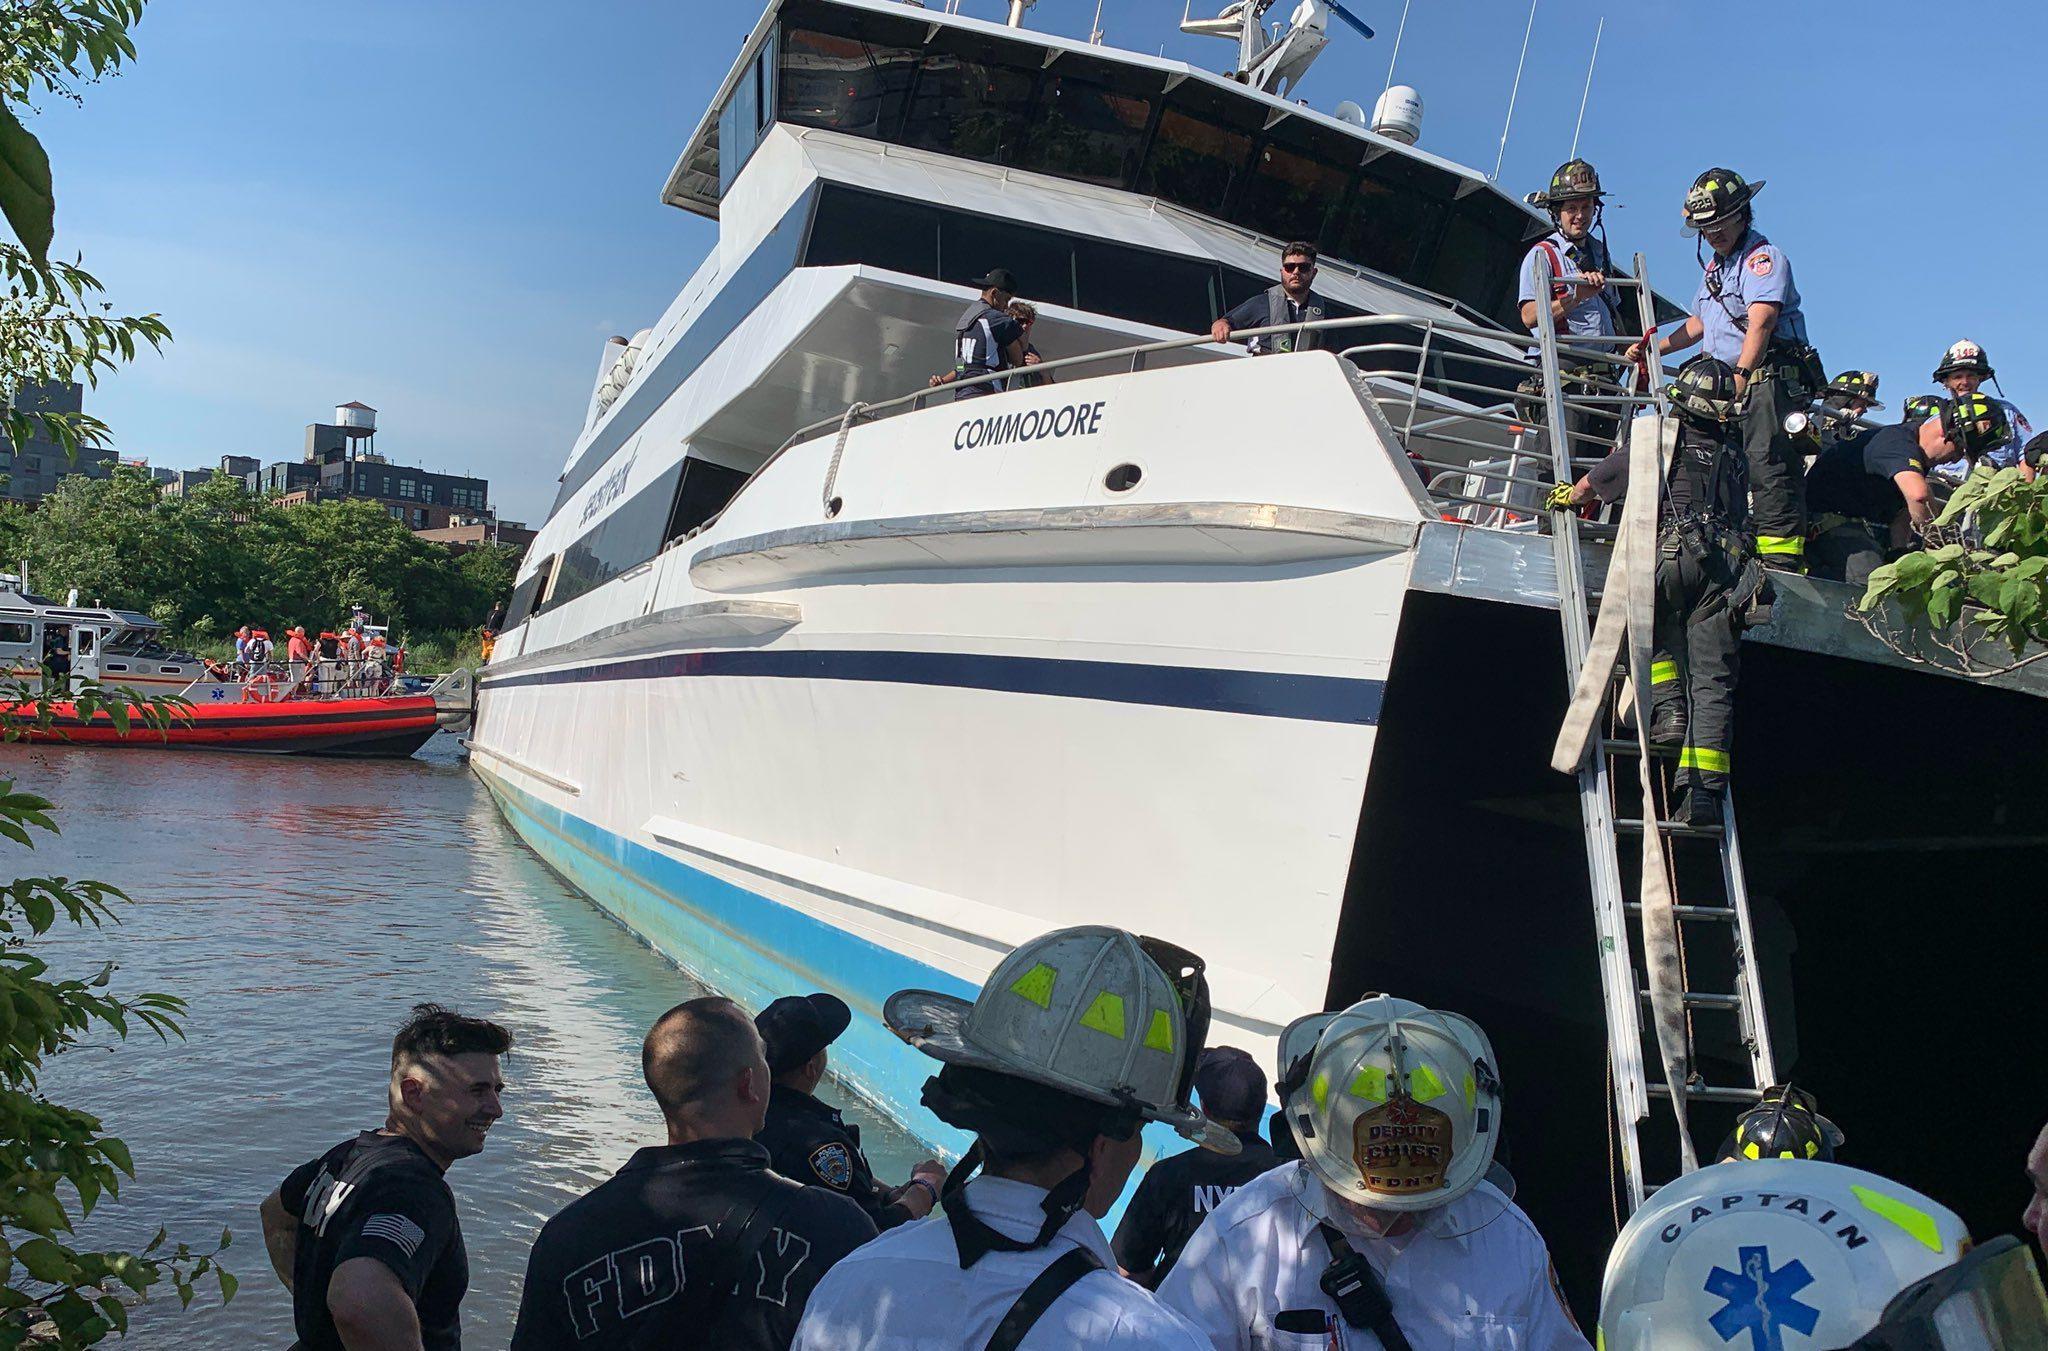 seastreak ferry grounding